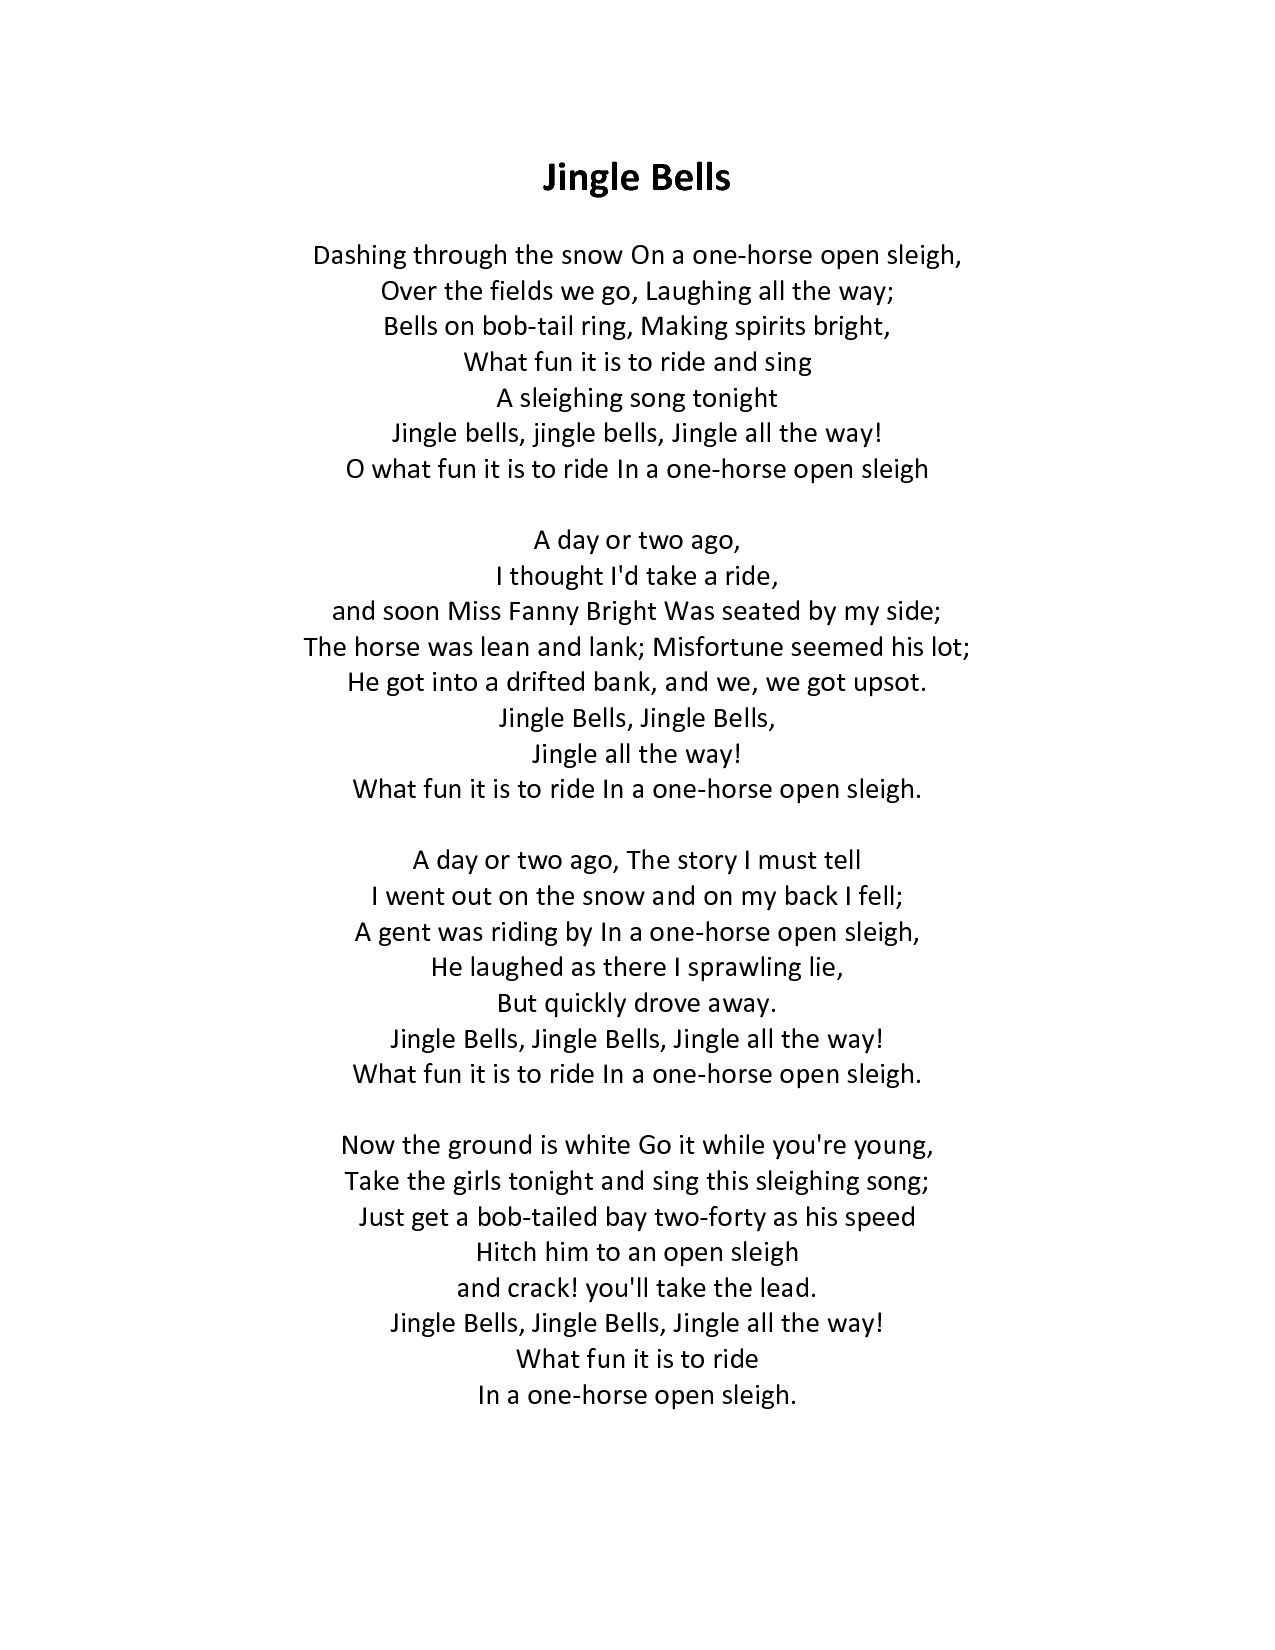 Jingle Bells - Lyrics! | Jingle bells lyrics, Making spirits bright, One horse open sleigh